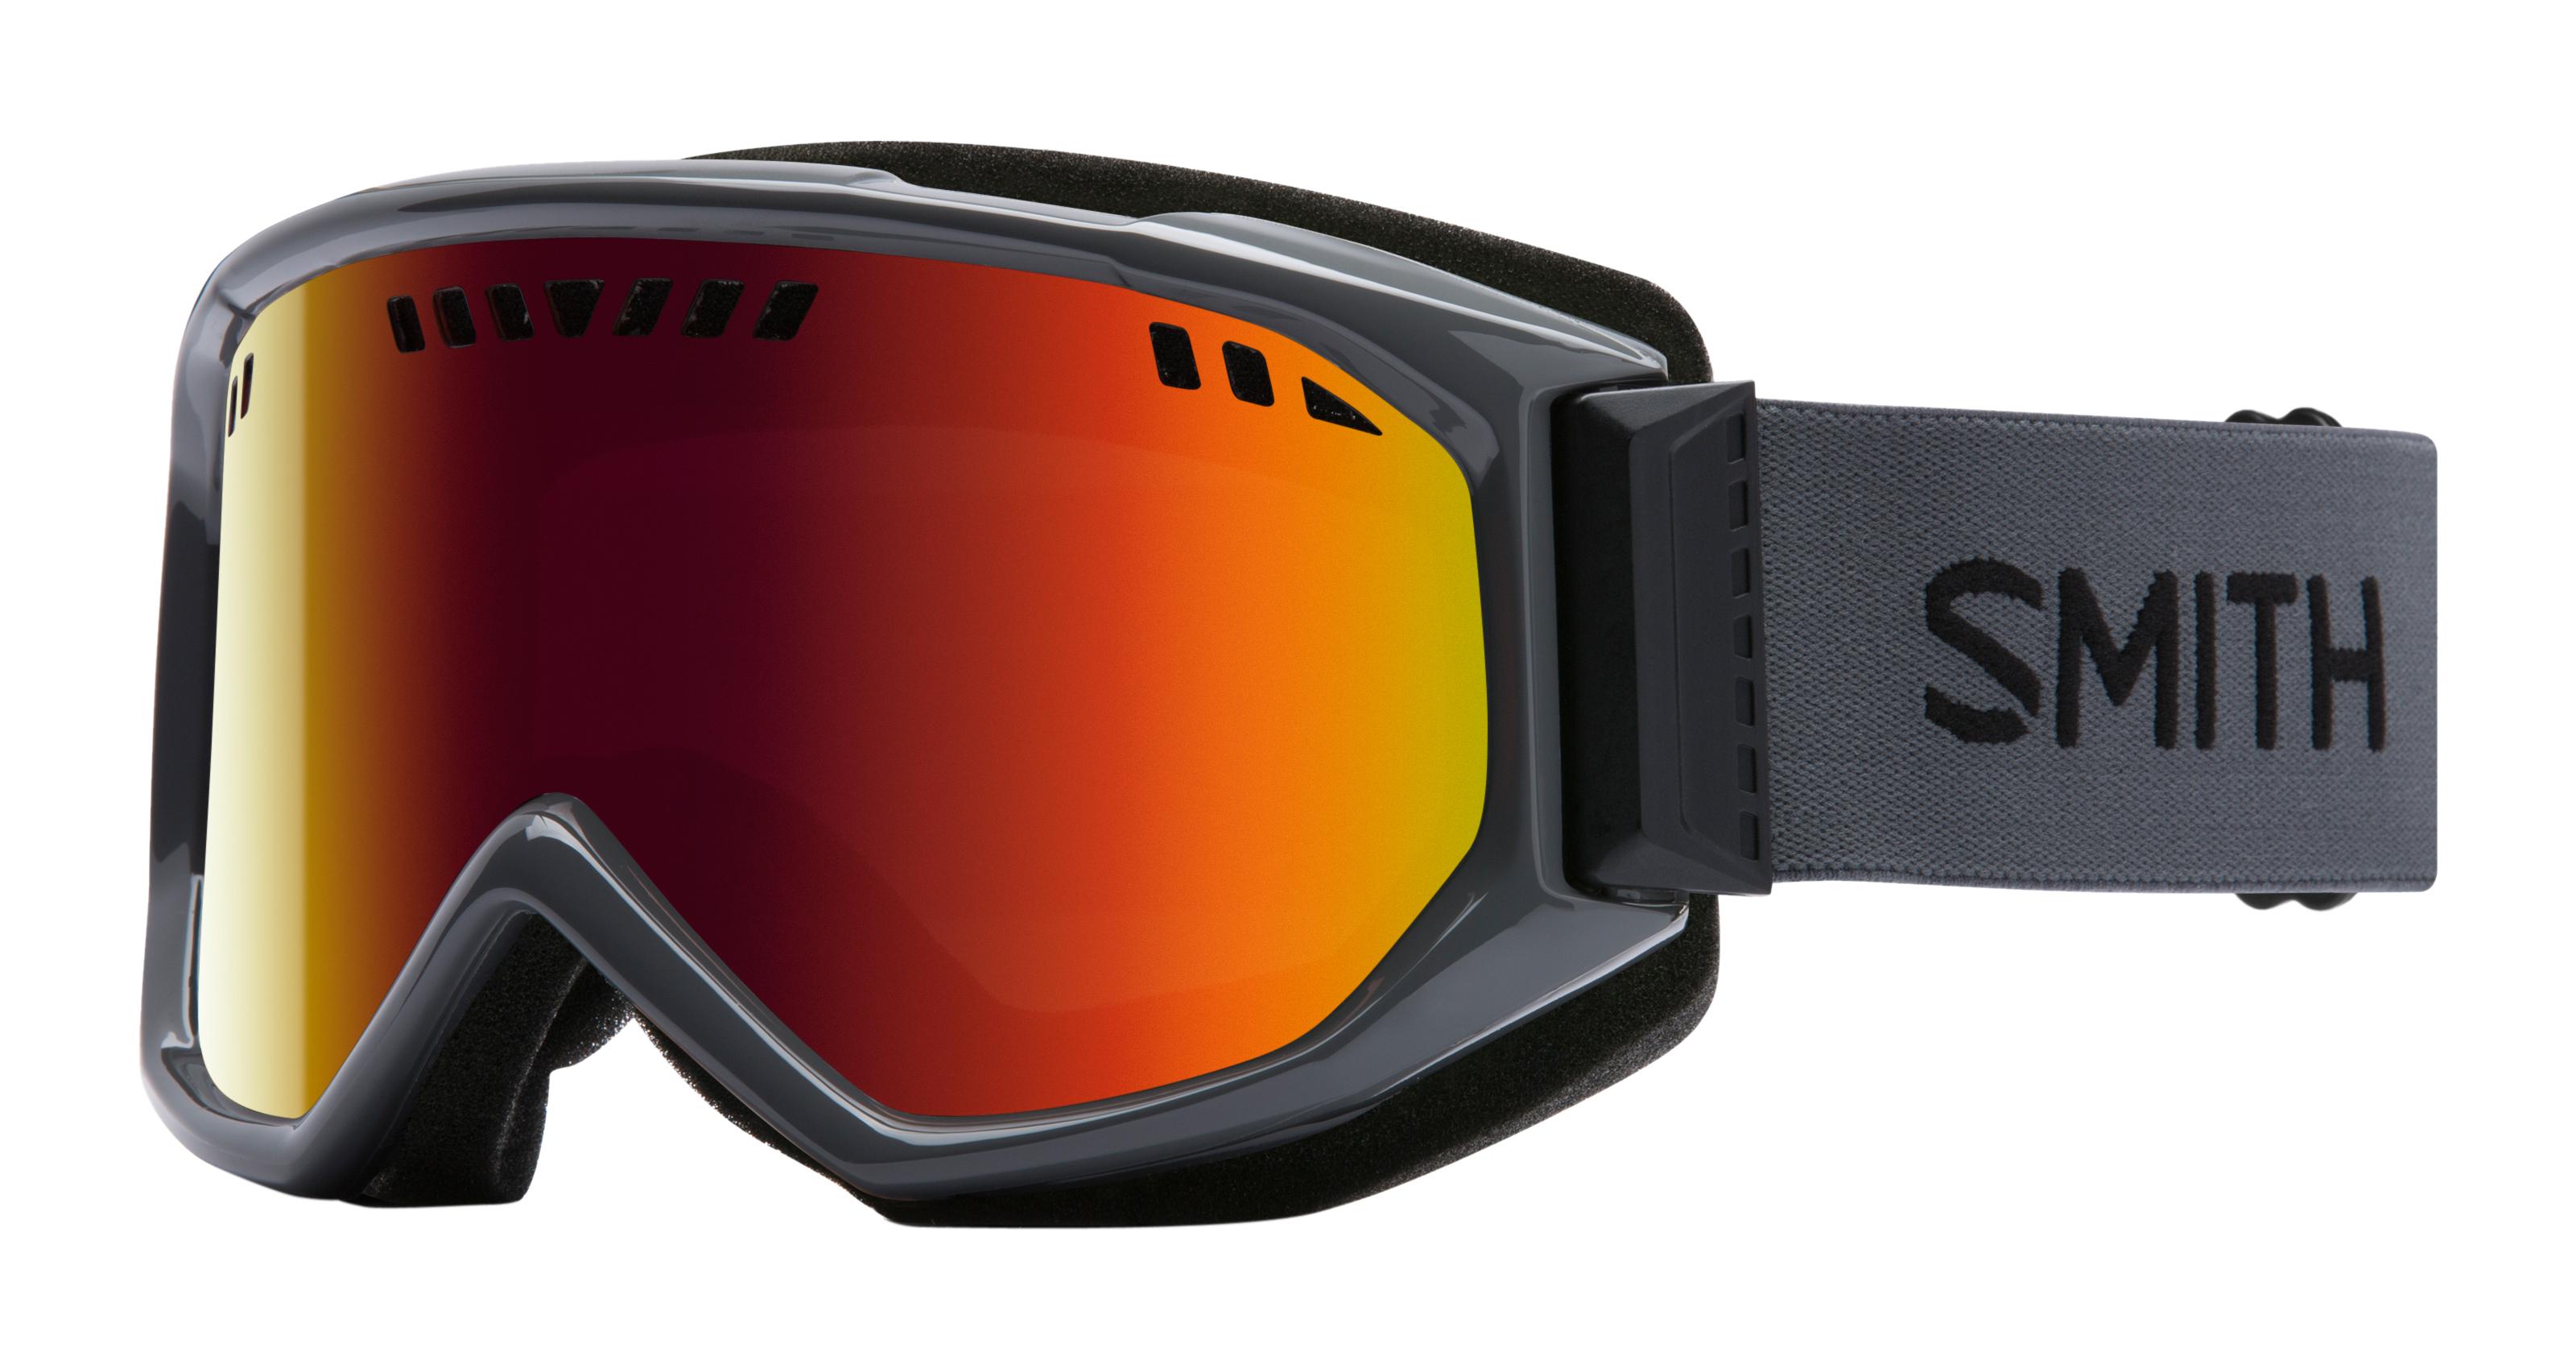 8a0345c208 Smith Scope Goggles - Unisex